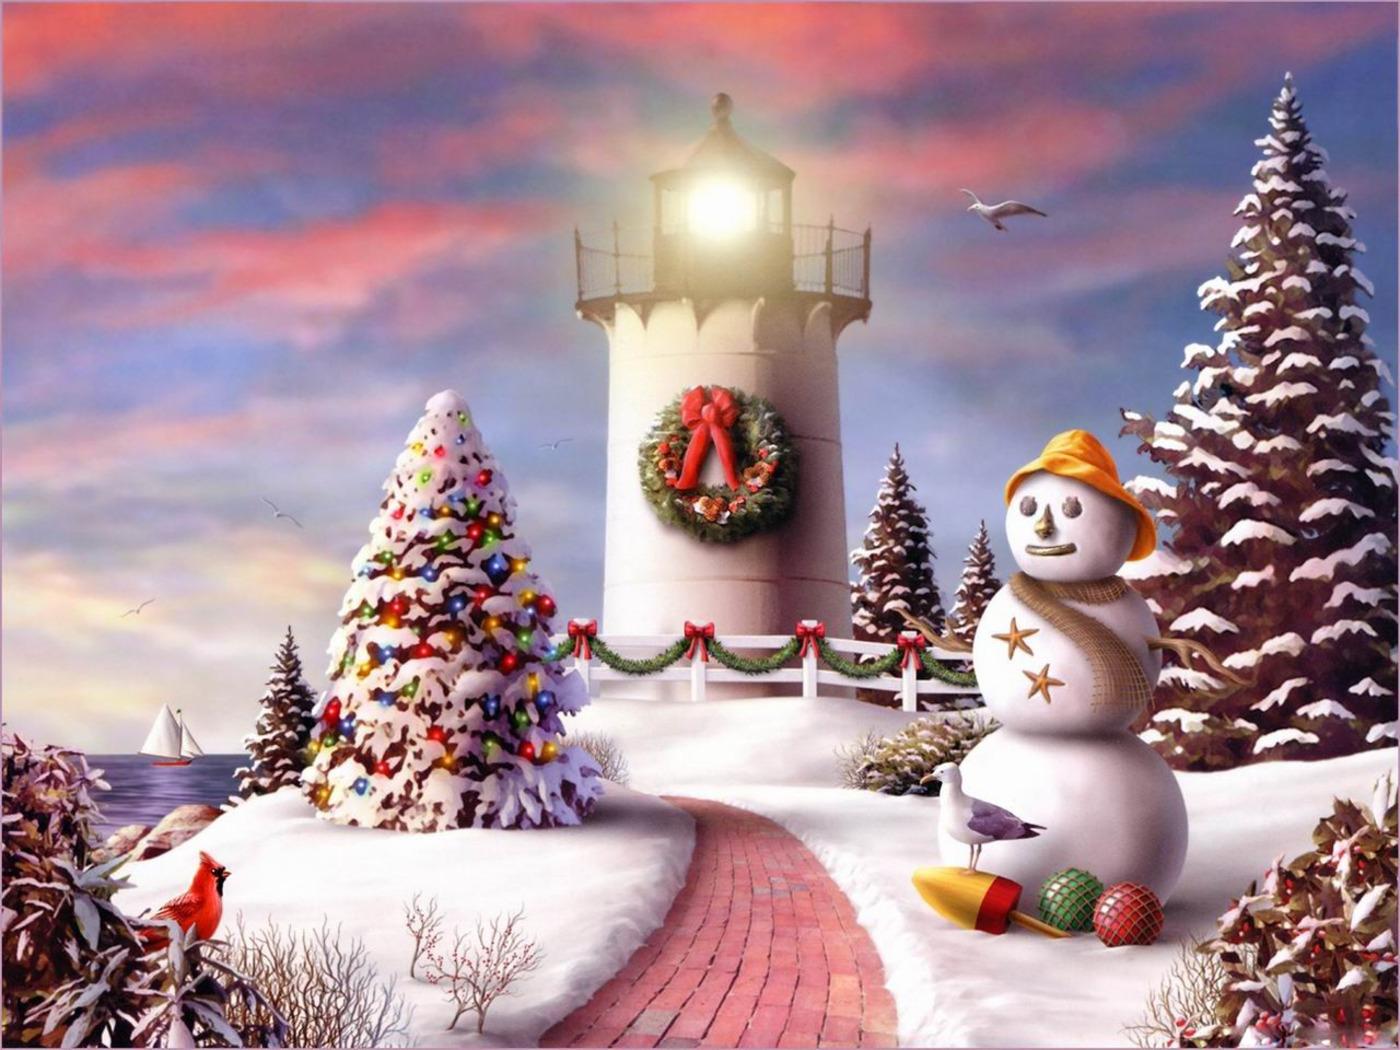 Free Christmas Wallpaper Downloads.77 Free Xmas Wallpapers On Wallpapersafari